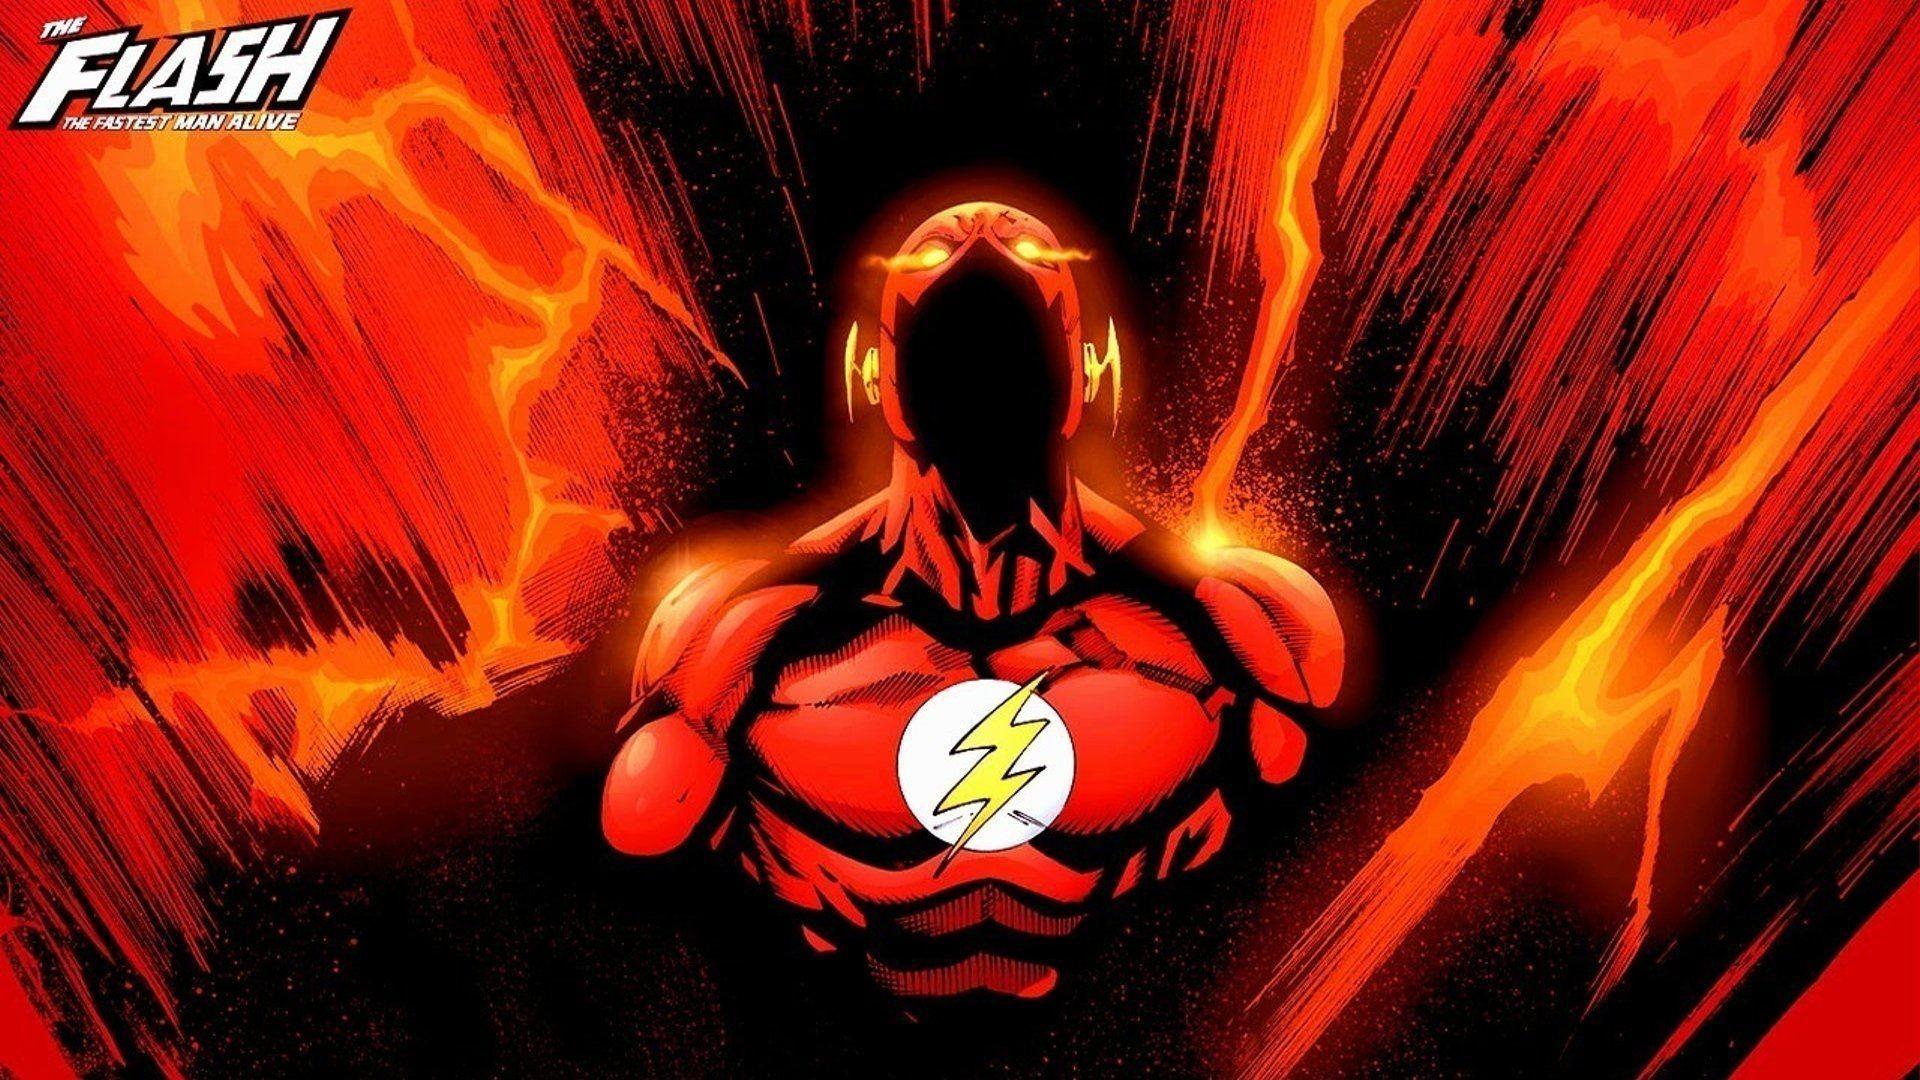 DC Comics The Flash Flash (superhero) wallpaper